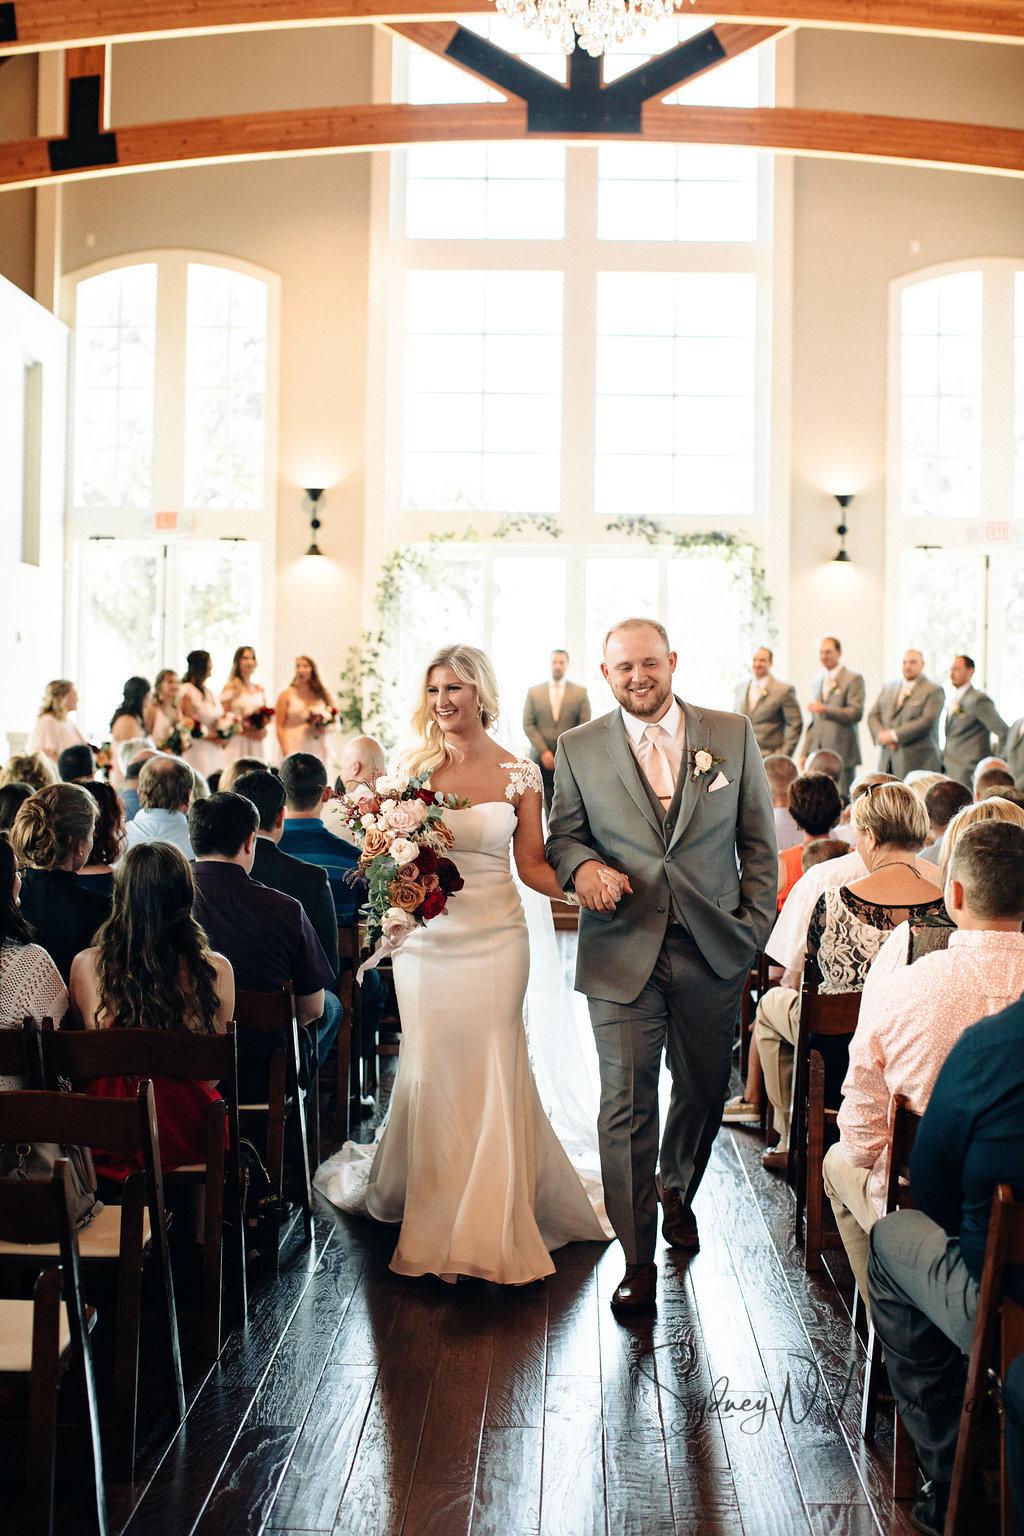 sydney-davidson-wedding-stillwater-oklahoma-wedding-session-traveling-photographer-portrait-tulsa-oklahoma-3016.jpg